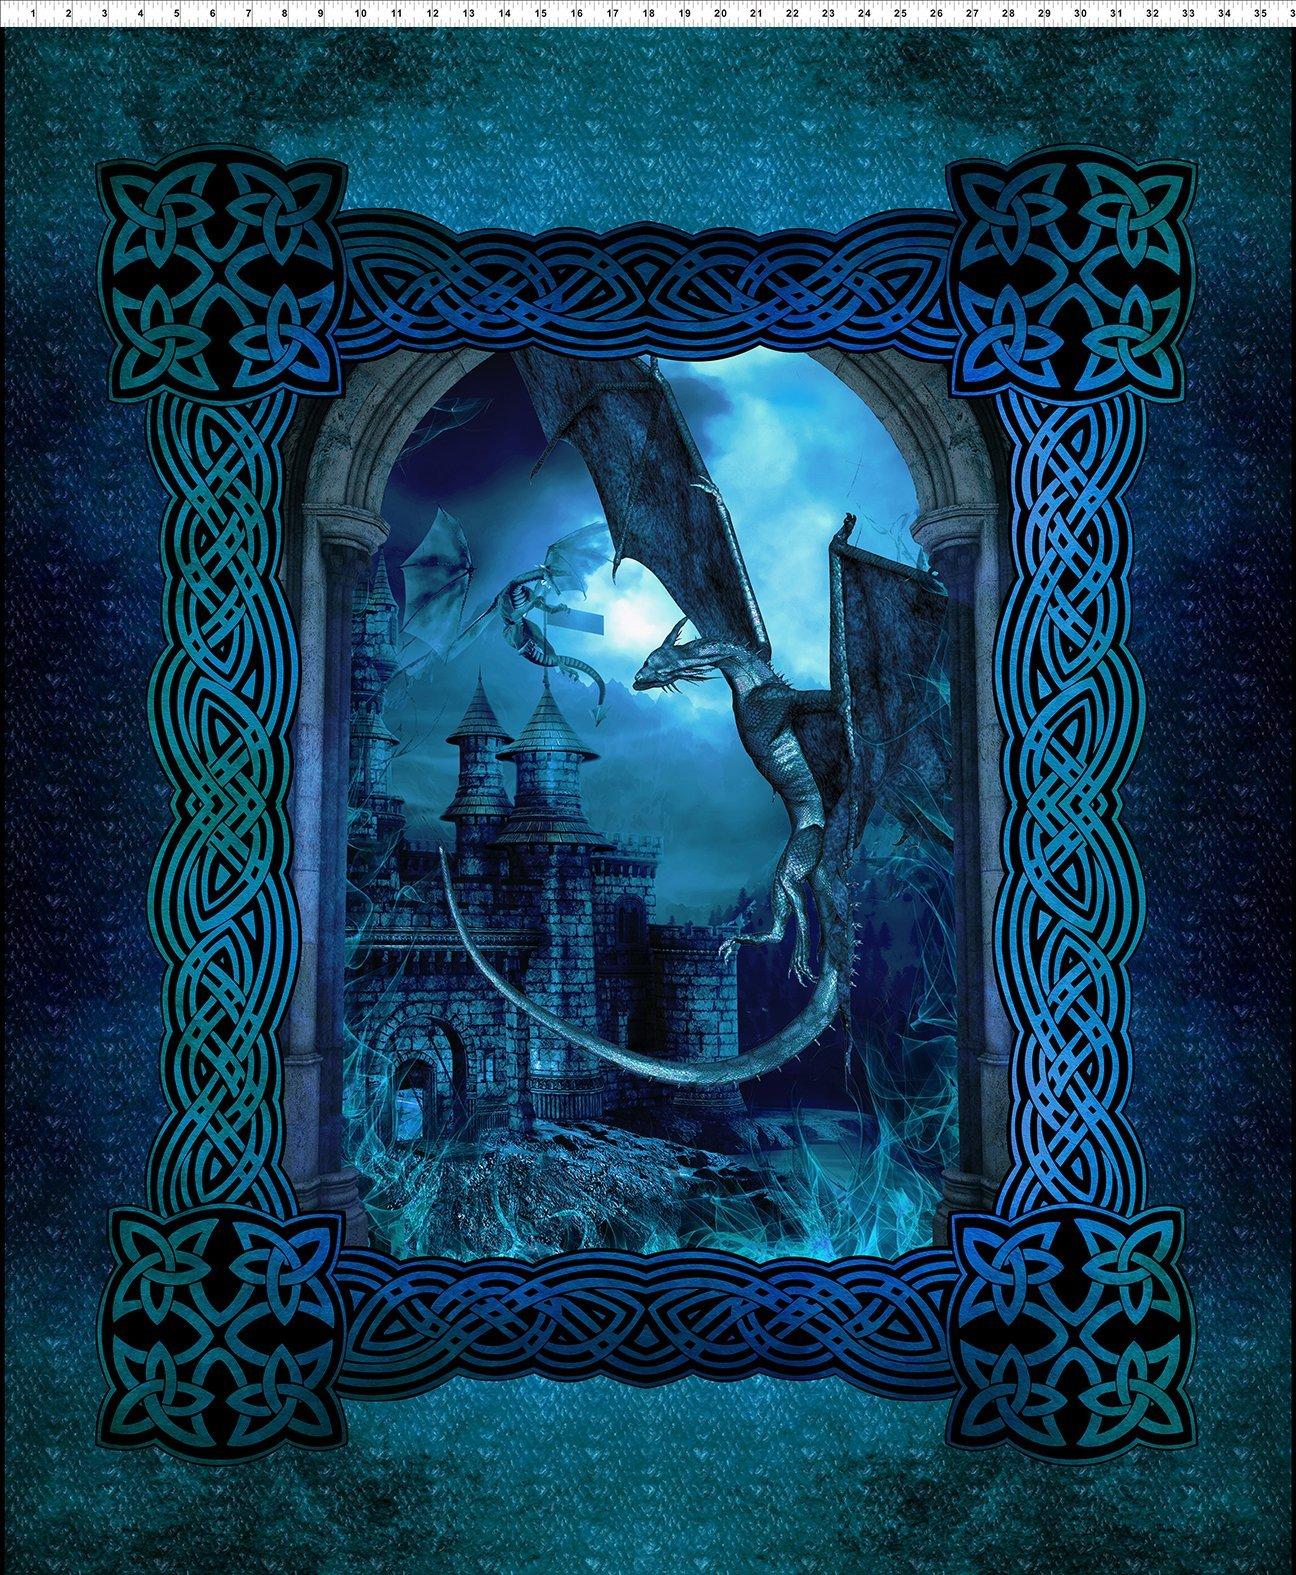 Dragons Blue Fury - large panel